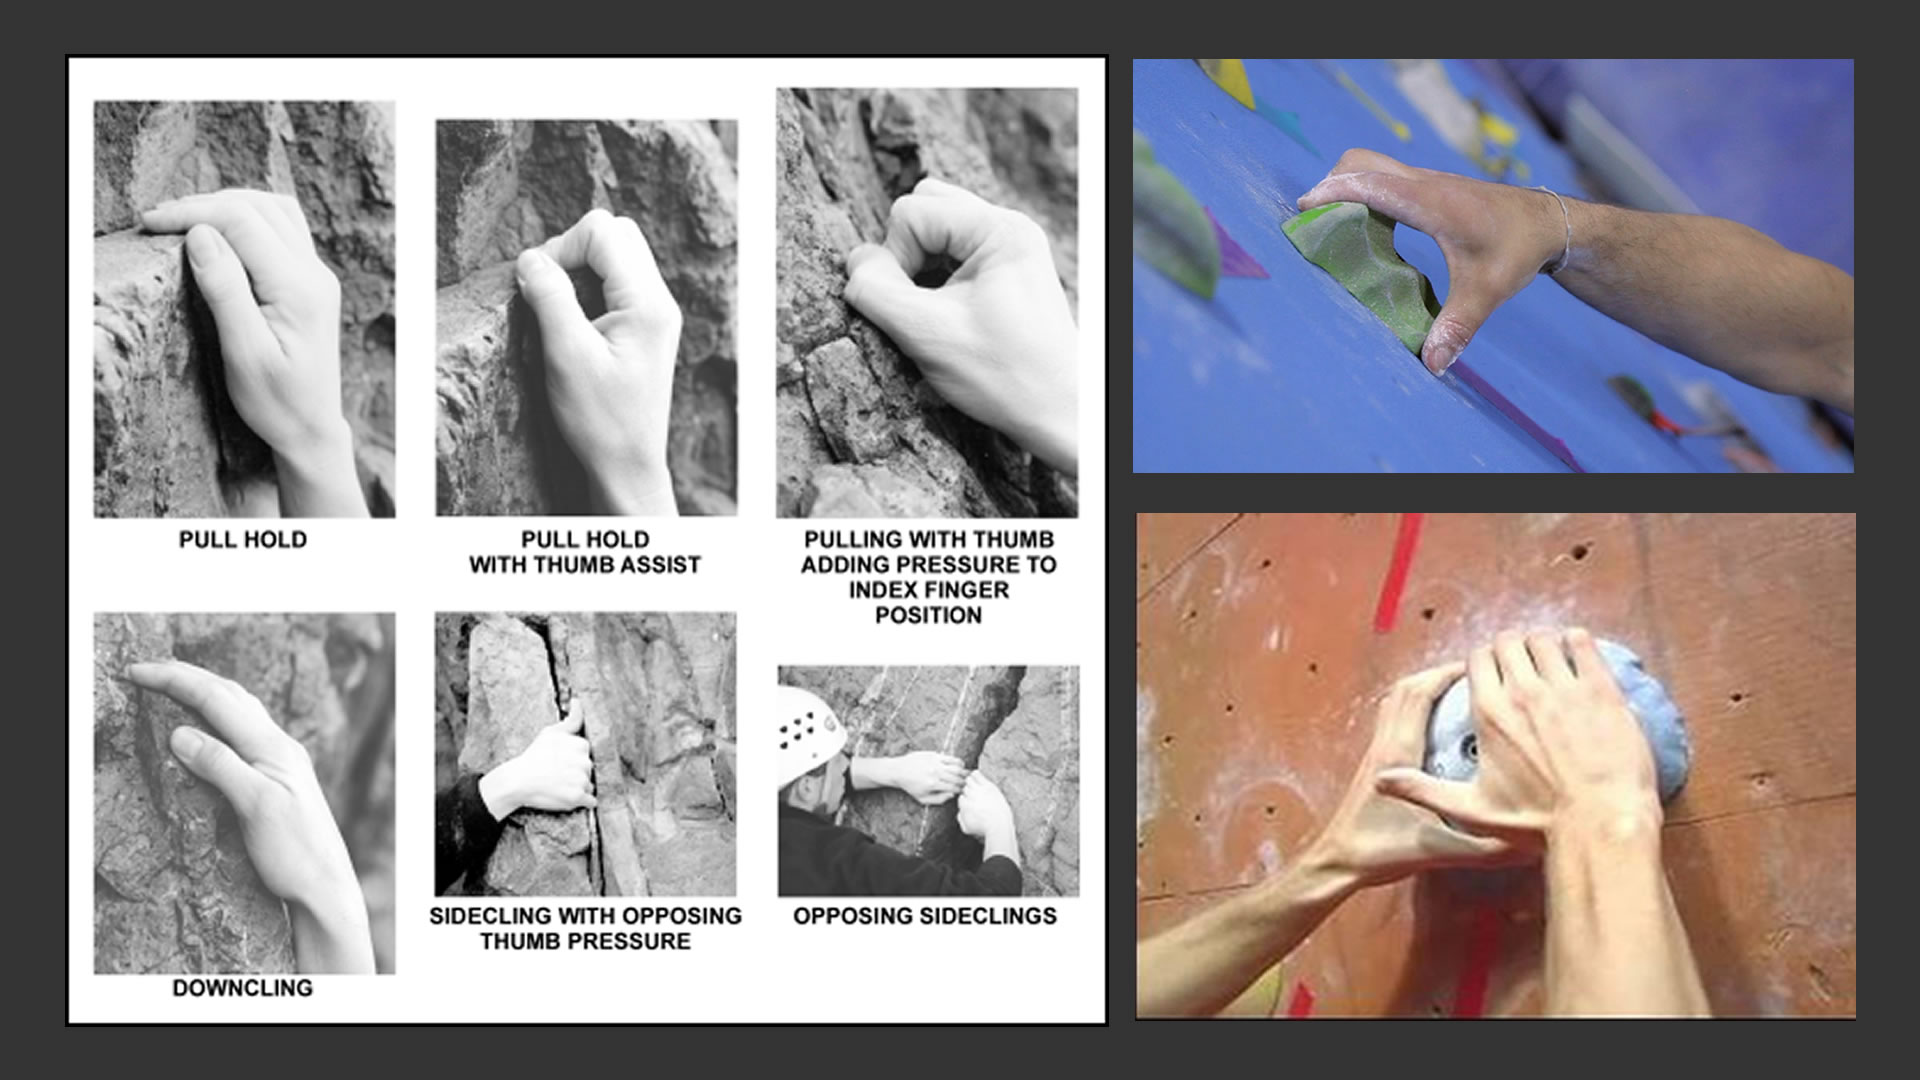 2_Affordances_and_hands.jpg